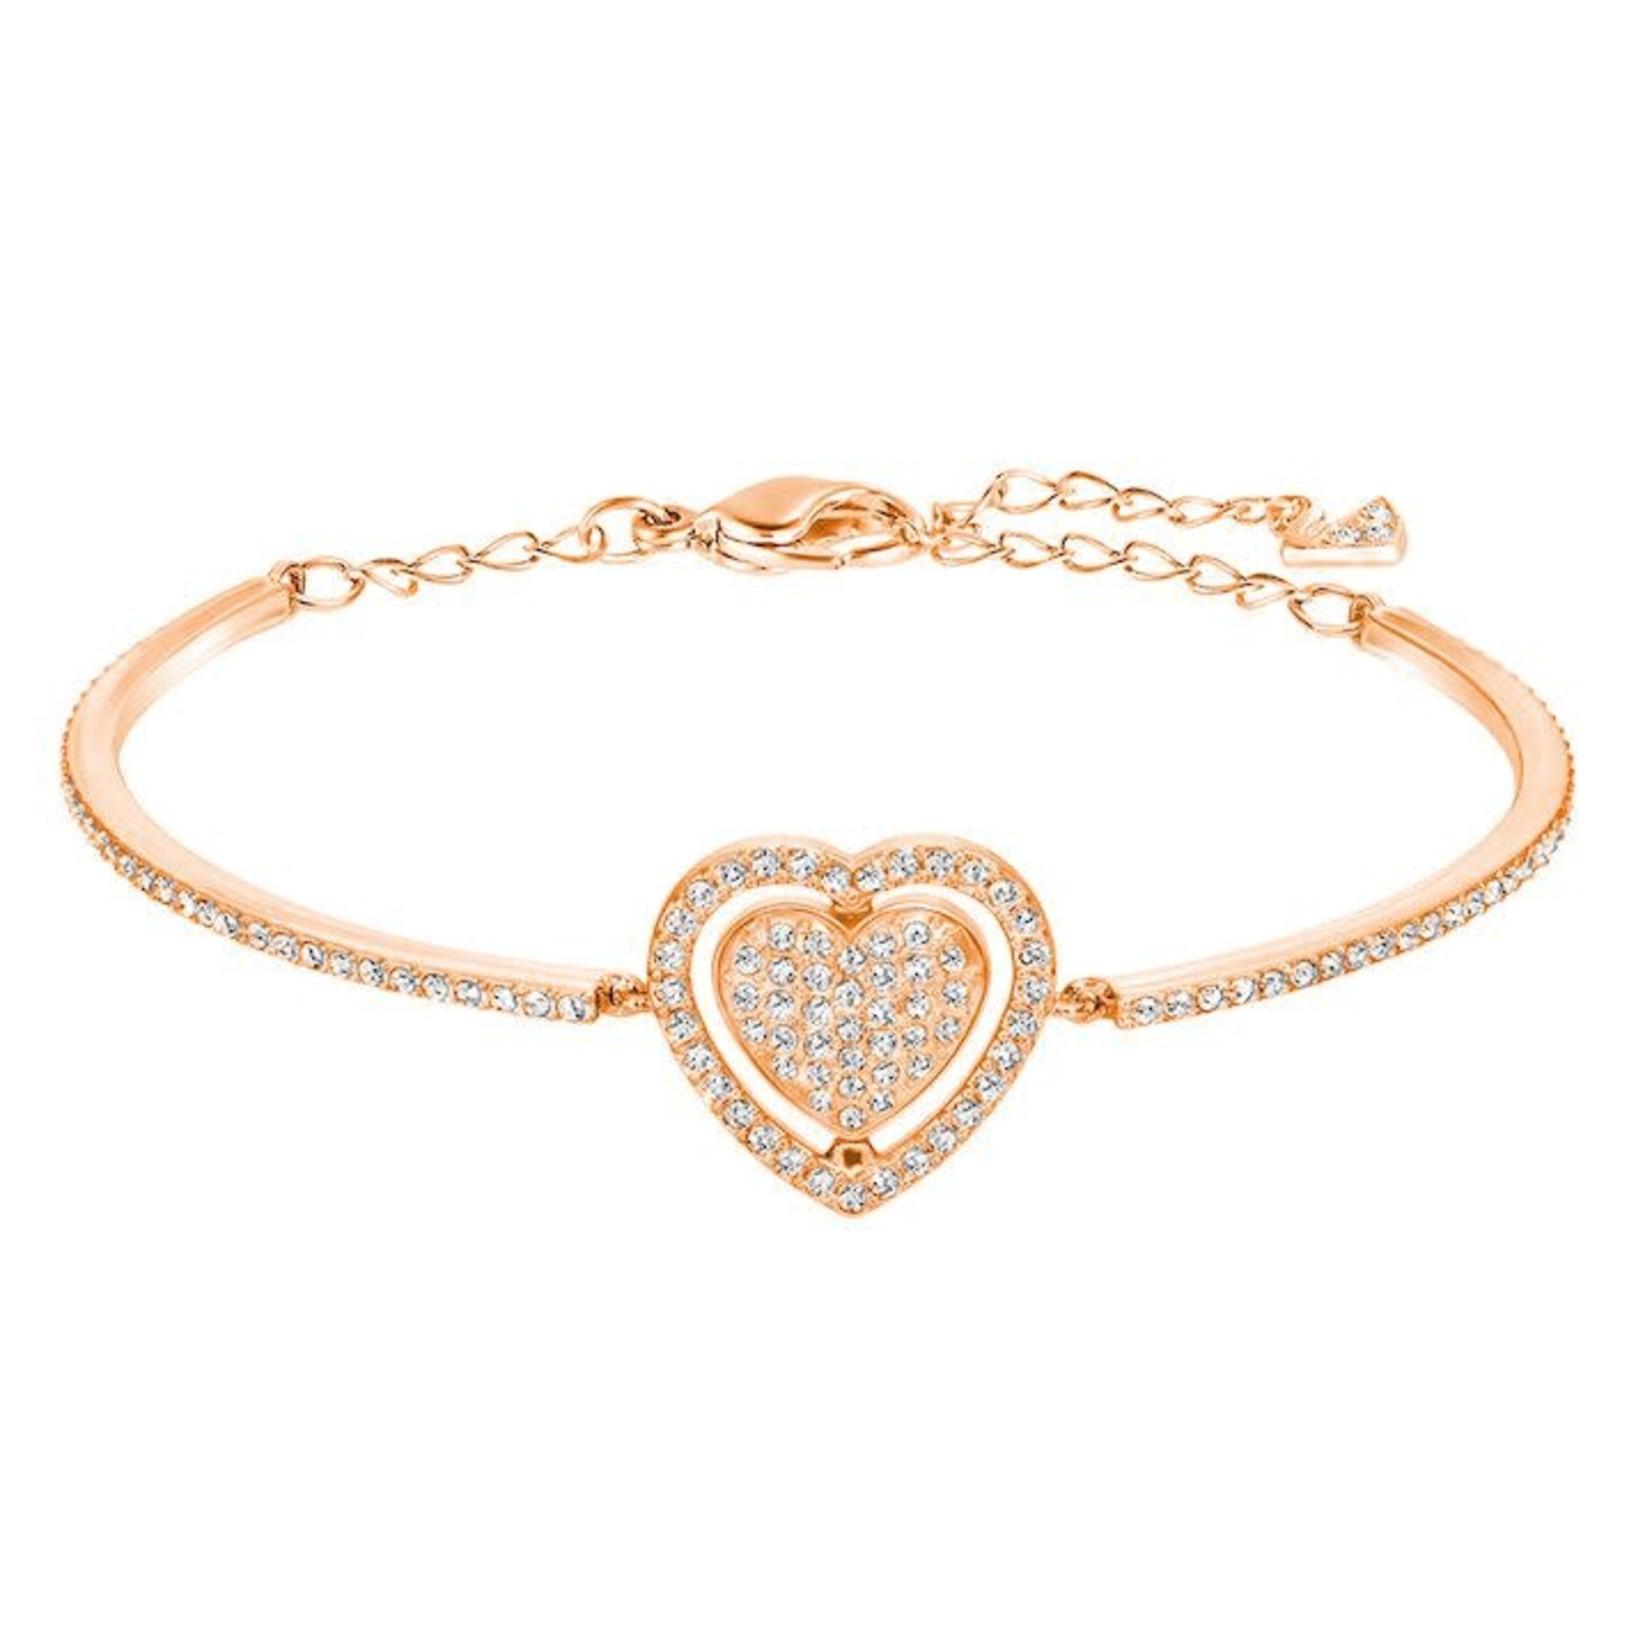 Swarovski Rose Gold Heart Engaged Bracelet/Bangle